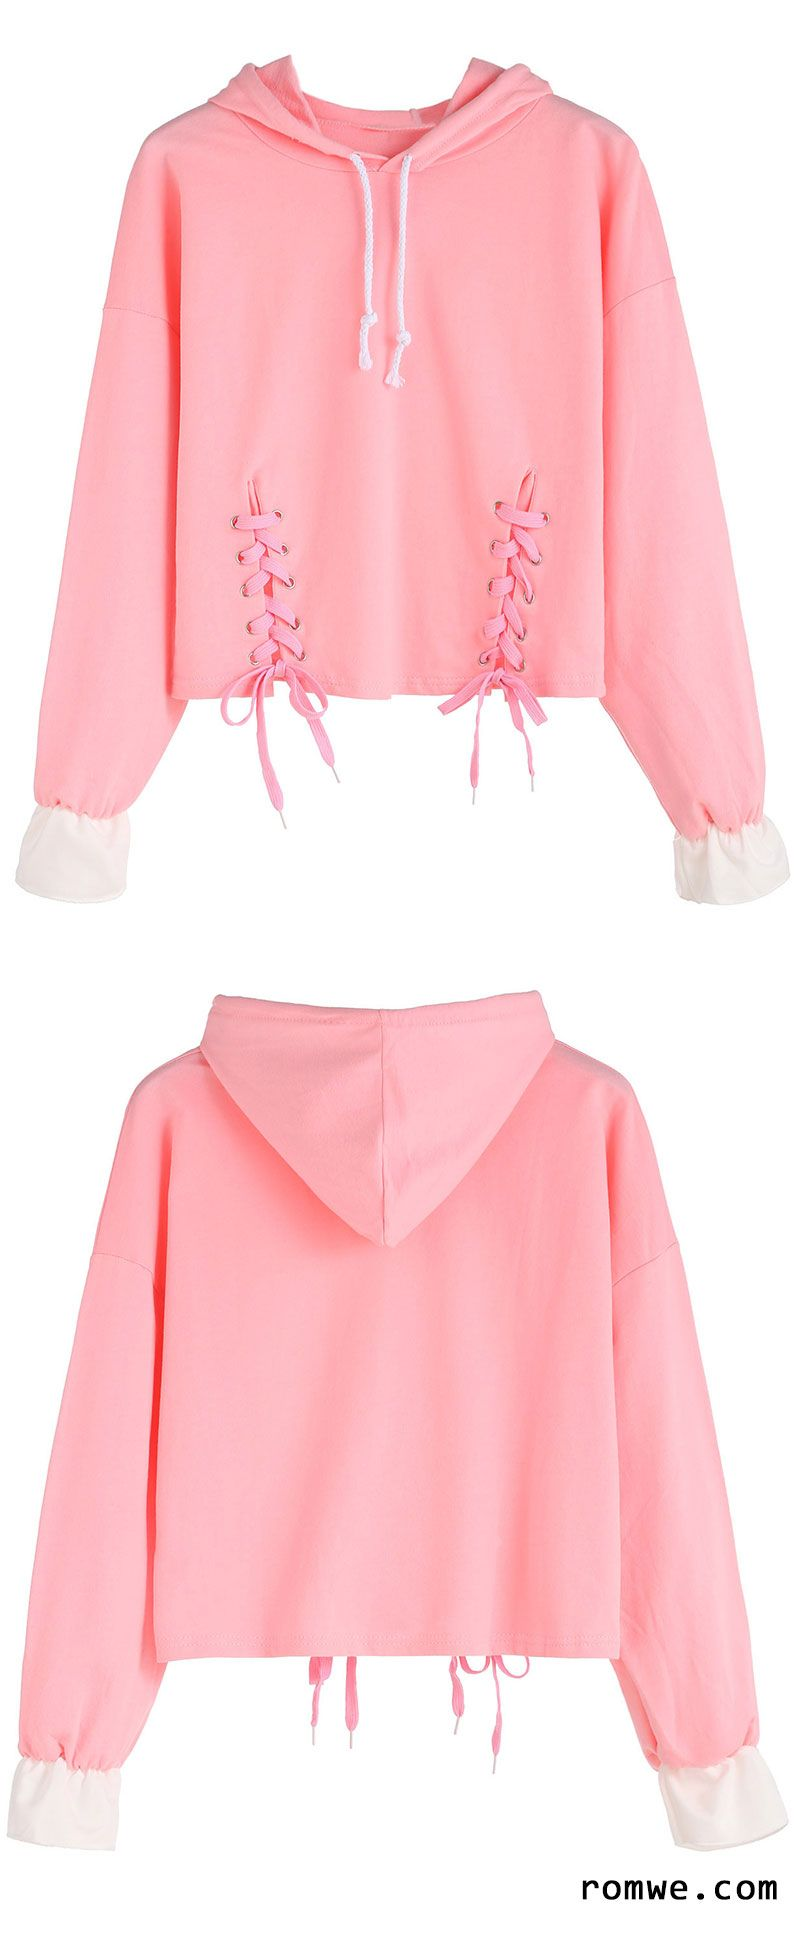 Pink Dropped Shoulder Seam Lace Up Drawstring Hooded Sweatshirt ... 1633e11ed